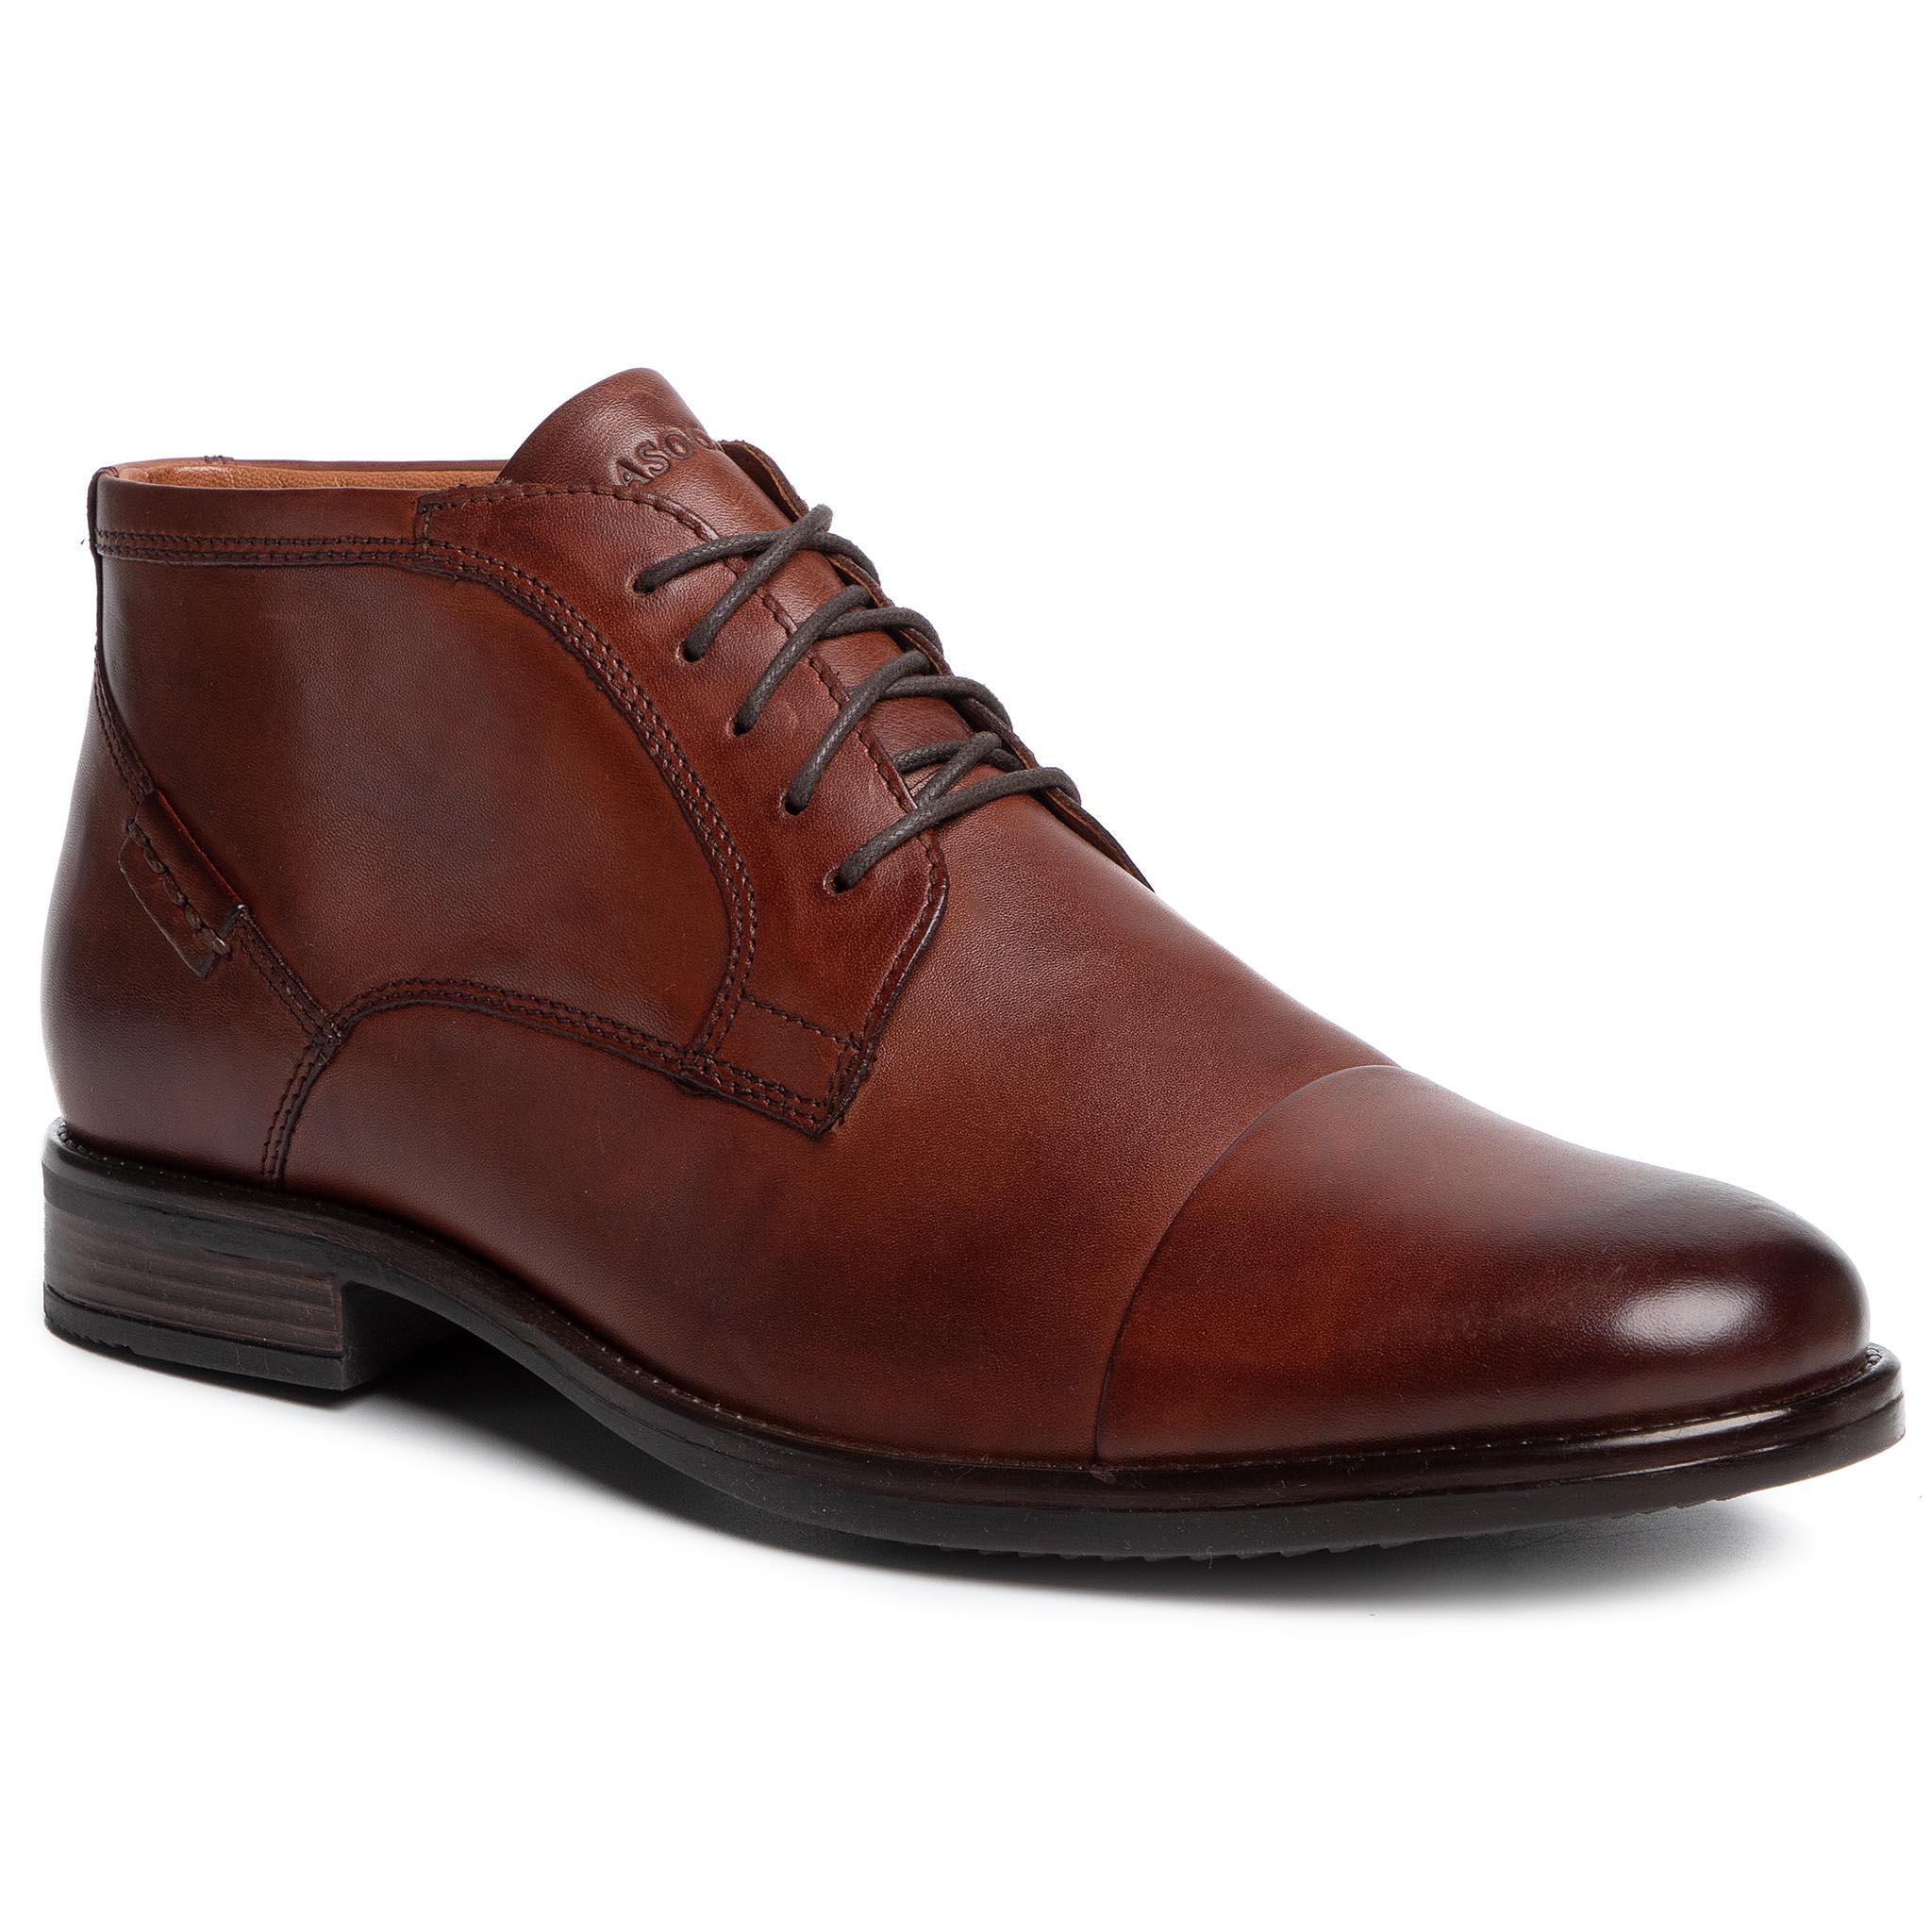 Outdoorová obuv LASOCKI FOR MEN - MB-NORWAY-60 Brown